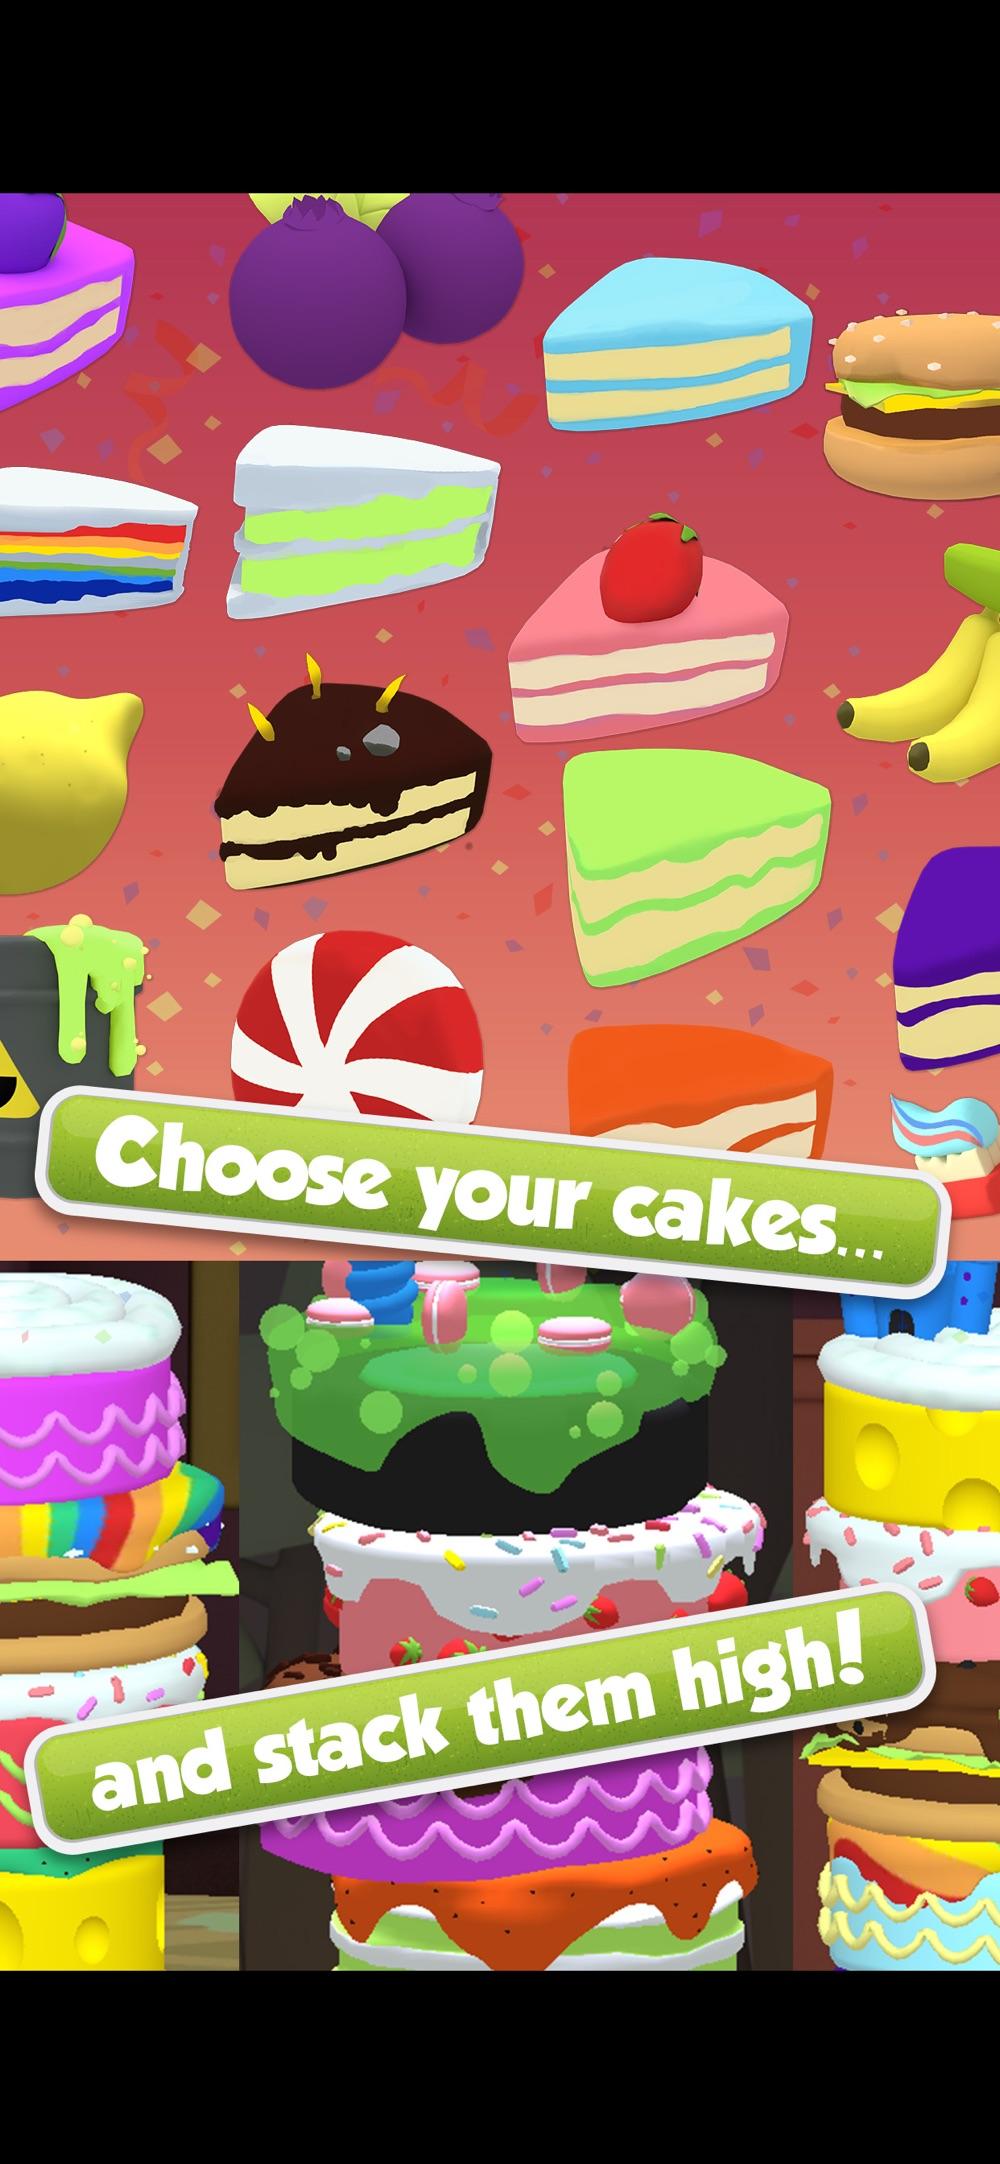 Bamba Birthday Cake hack tool